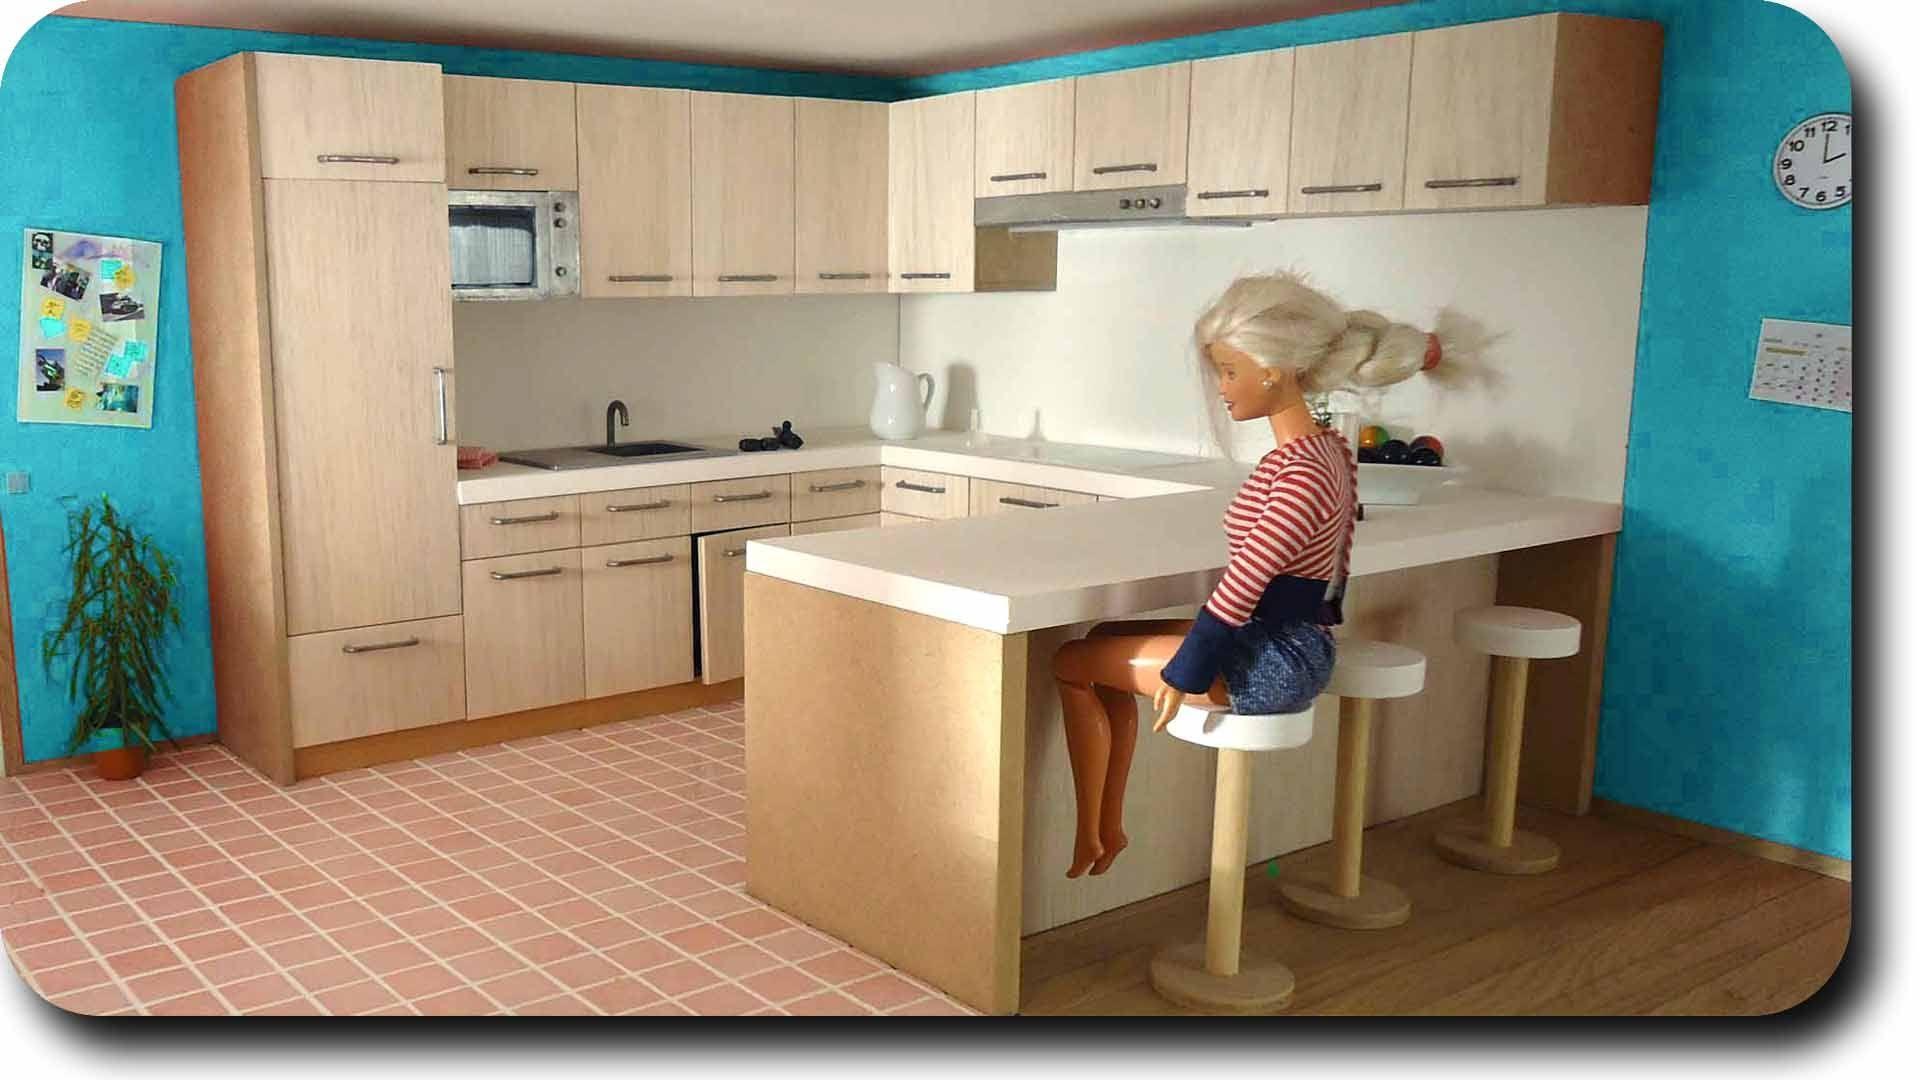 homemade barbie furniture ideas. Casa Barbie · Homemade DollhouseDollhouse IdeasDollhouse Furniture Ideas